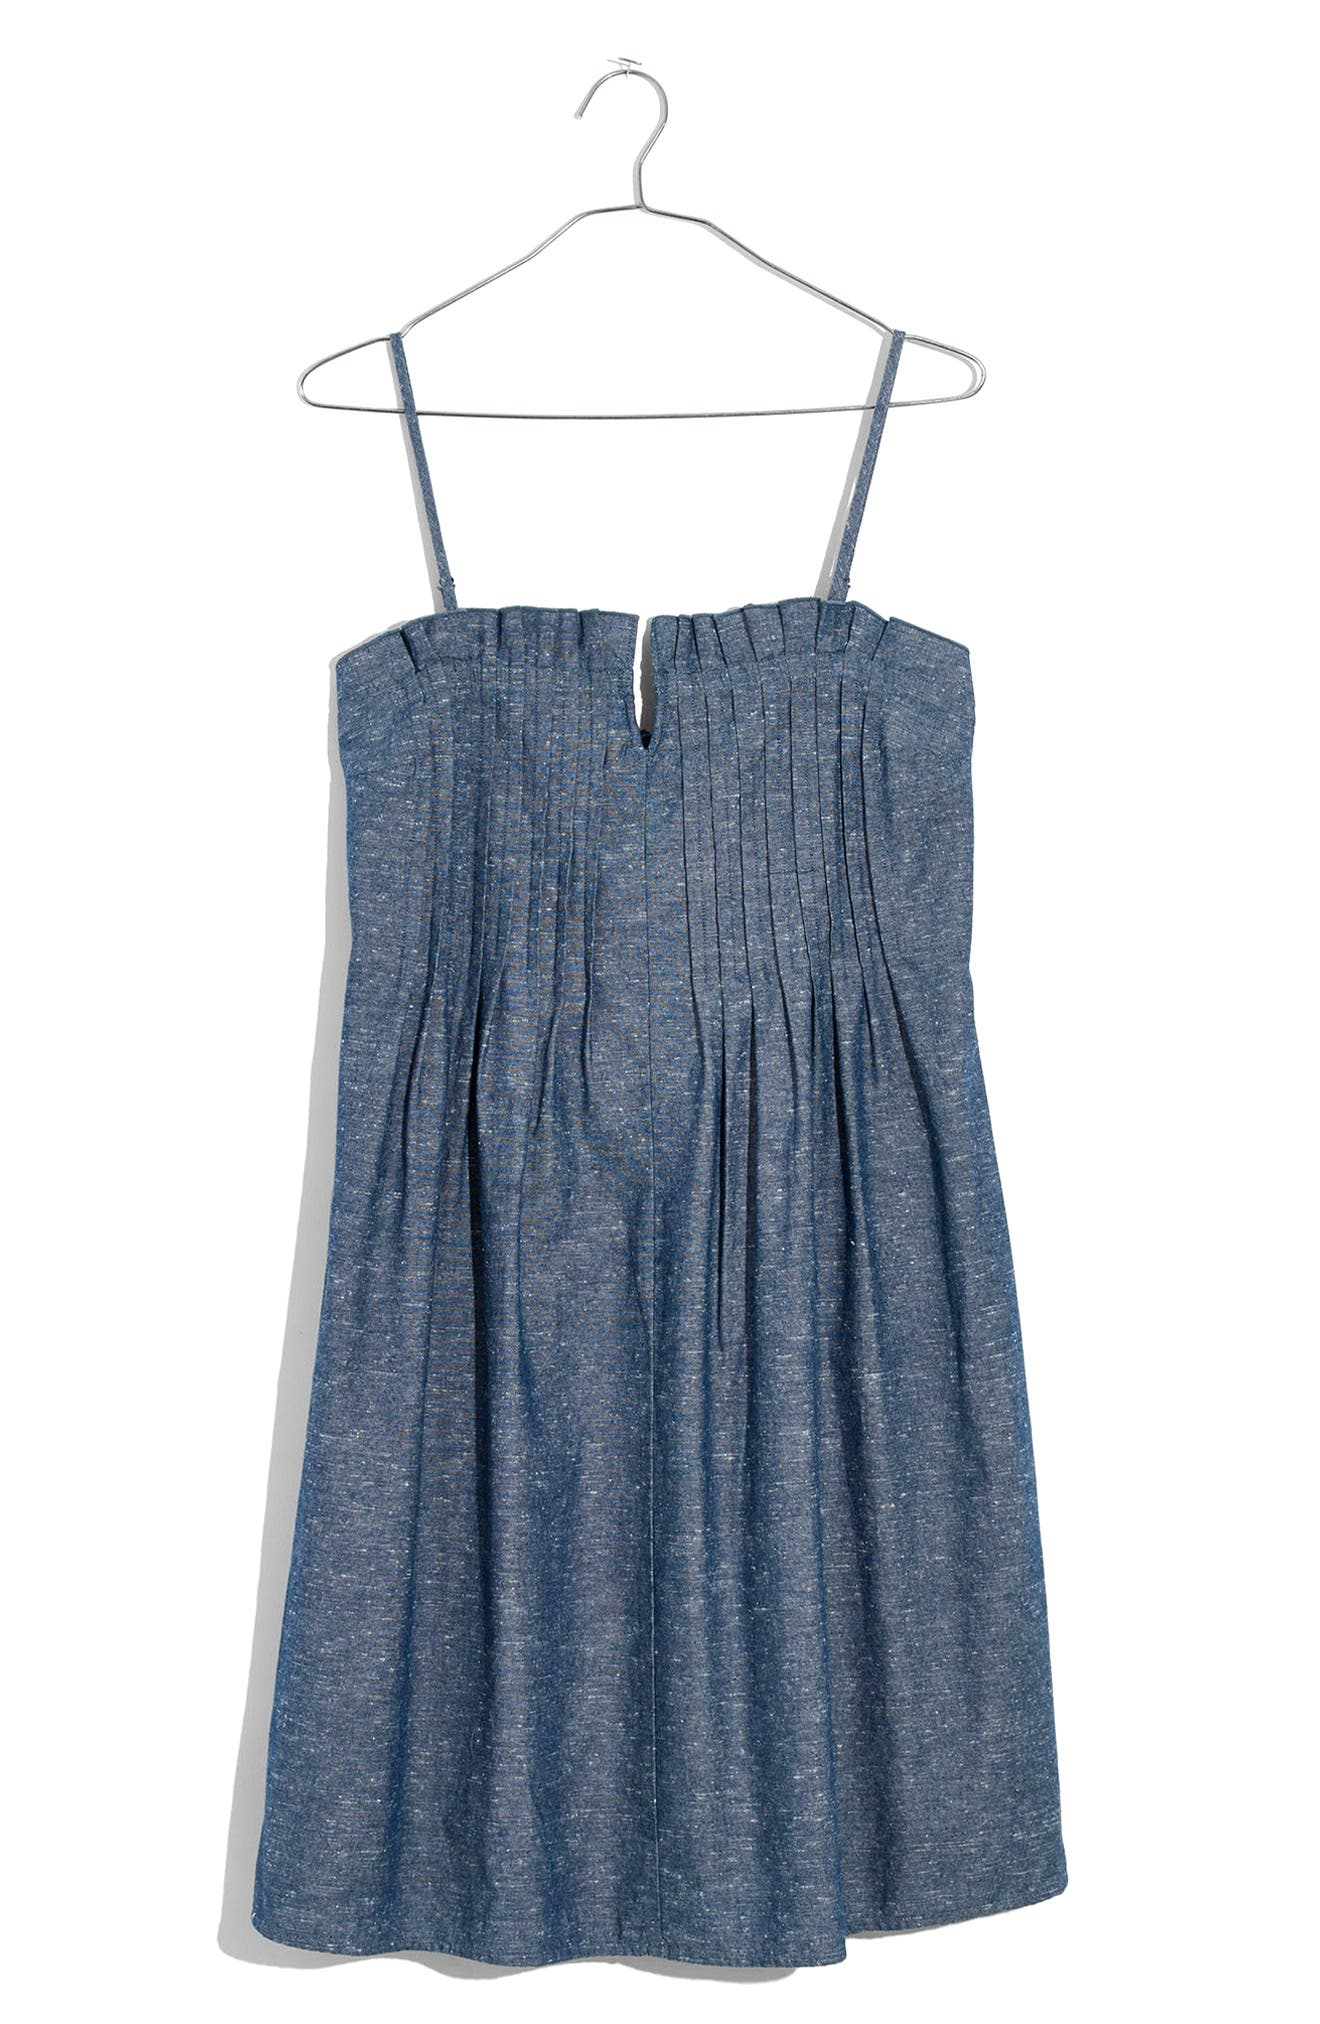 Pintuck Denim Camisole Dress,                             Alternate thumbnail 3, color,                             Brilliant Royal